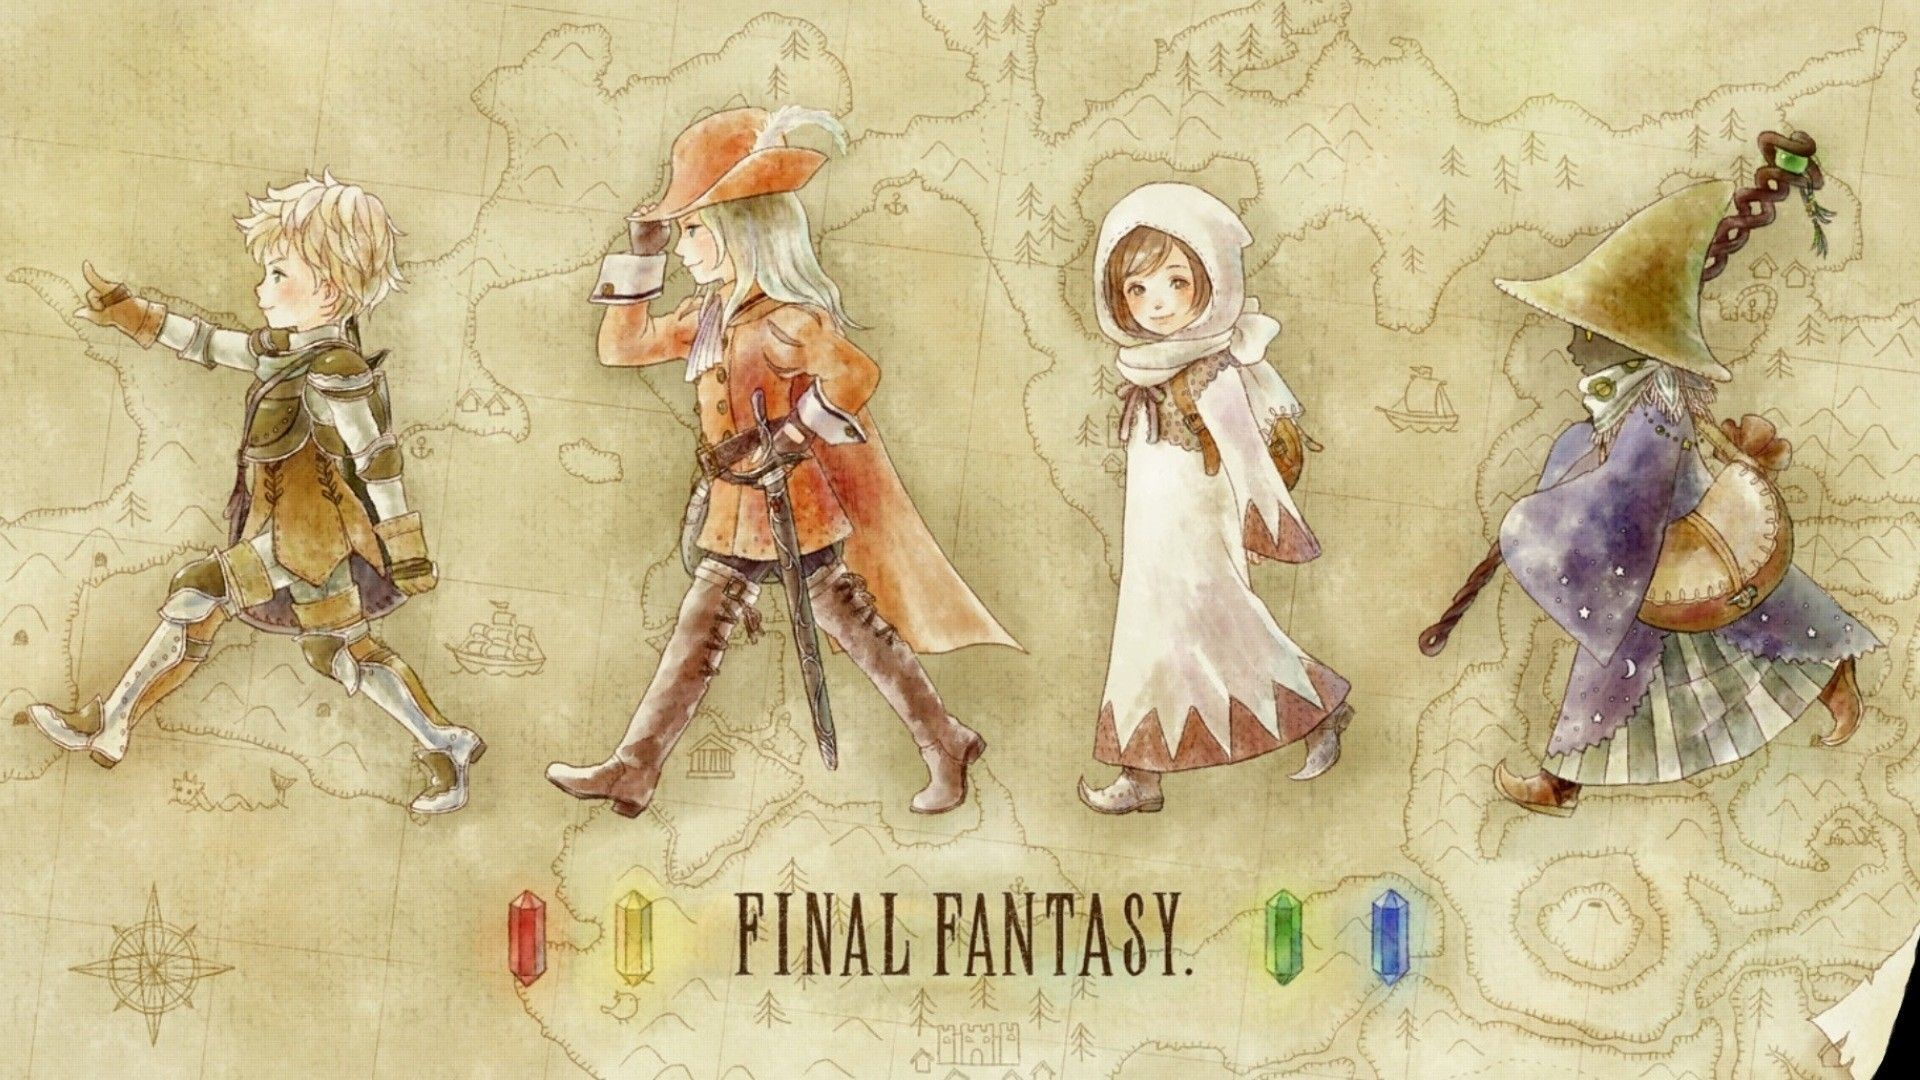 Final Fantasy Phone Photo. Widescreen Wallpapers …